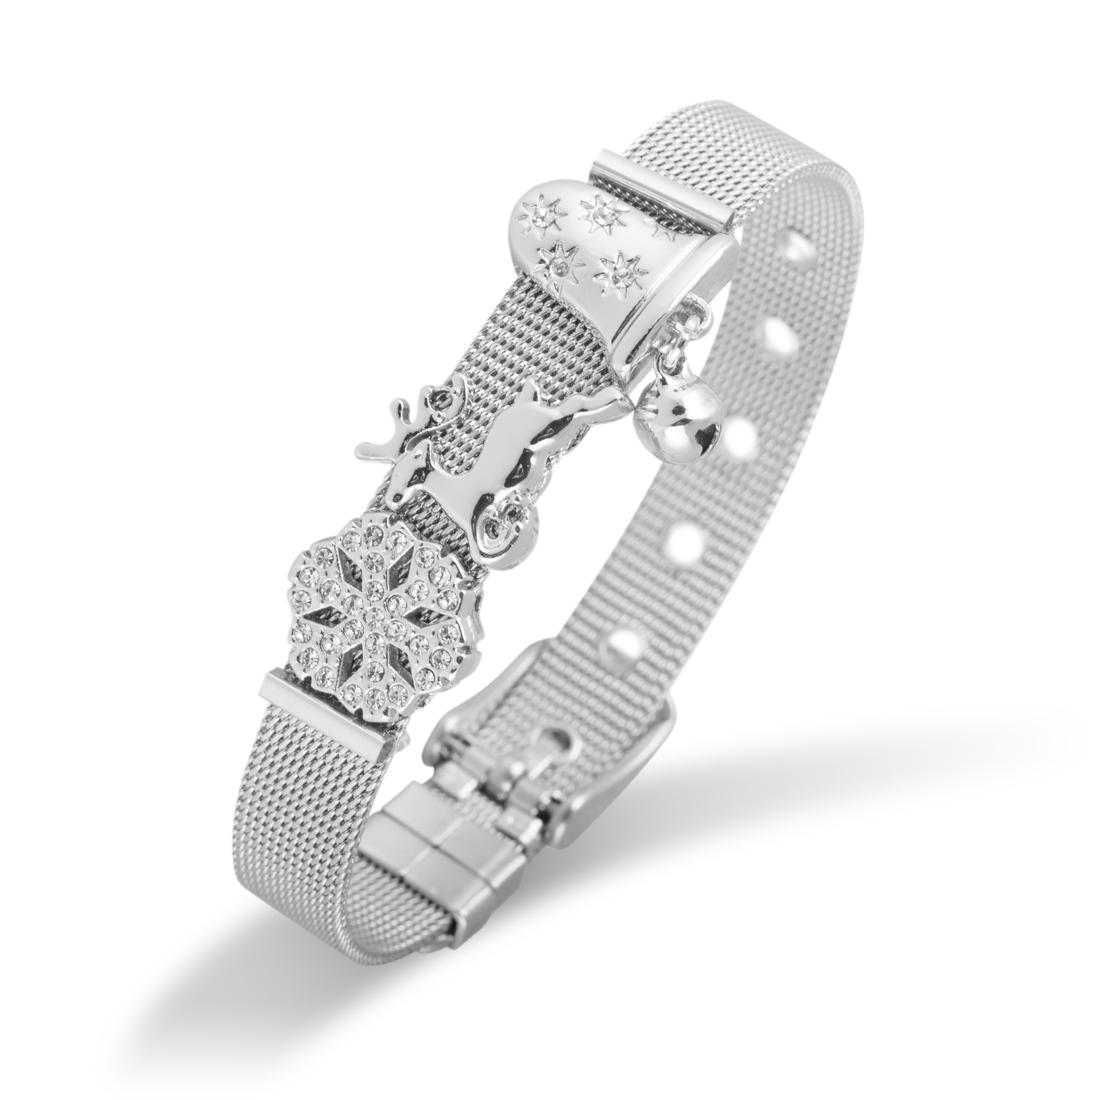 Pierre Ricaud PR153.5 - biżuteria